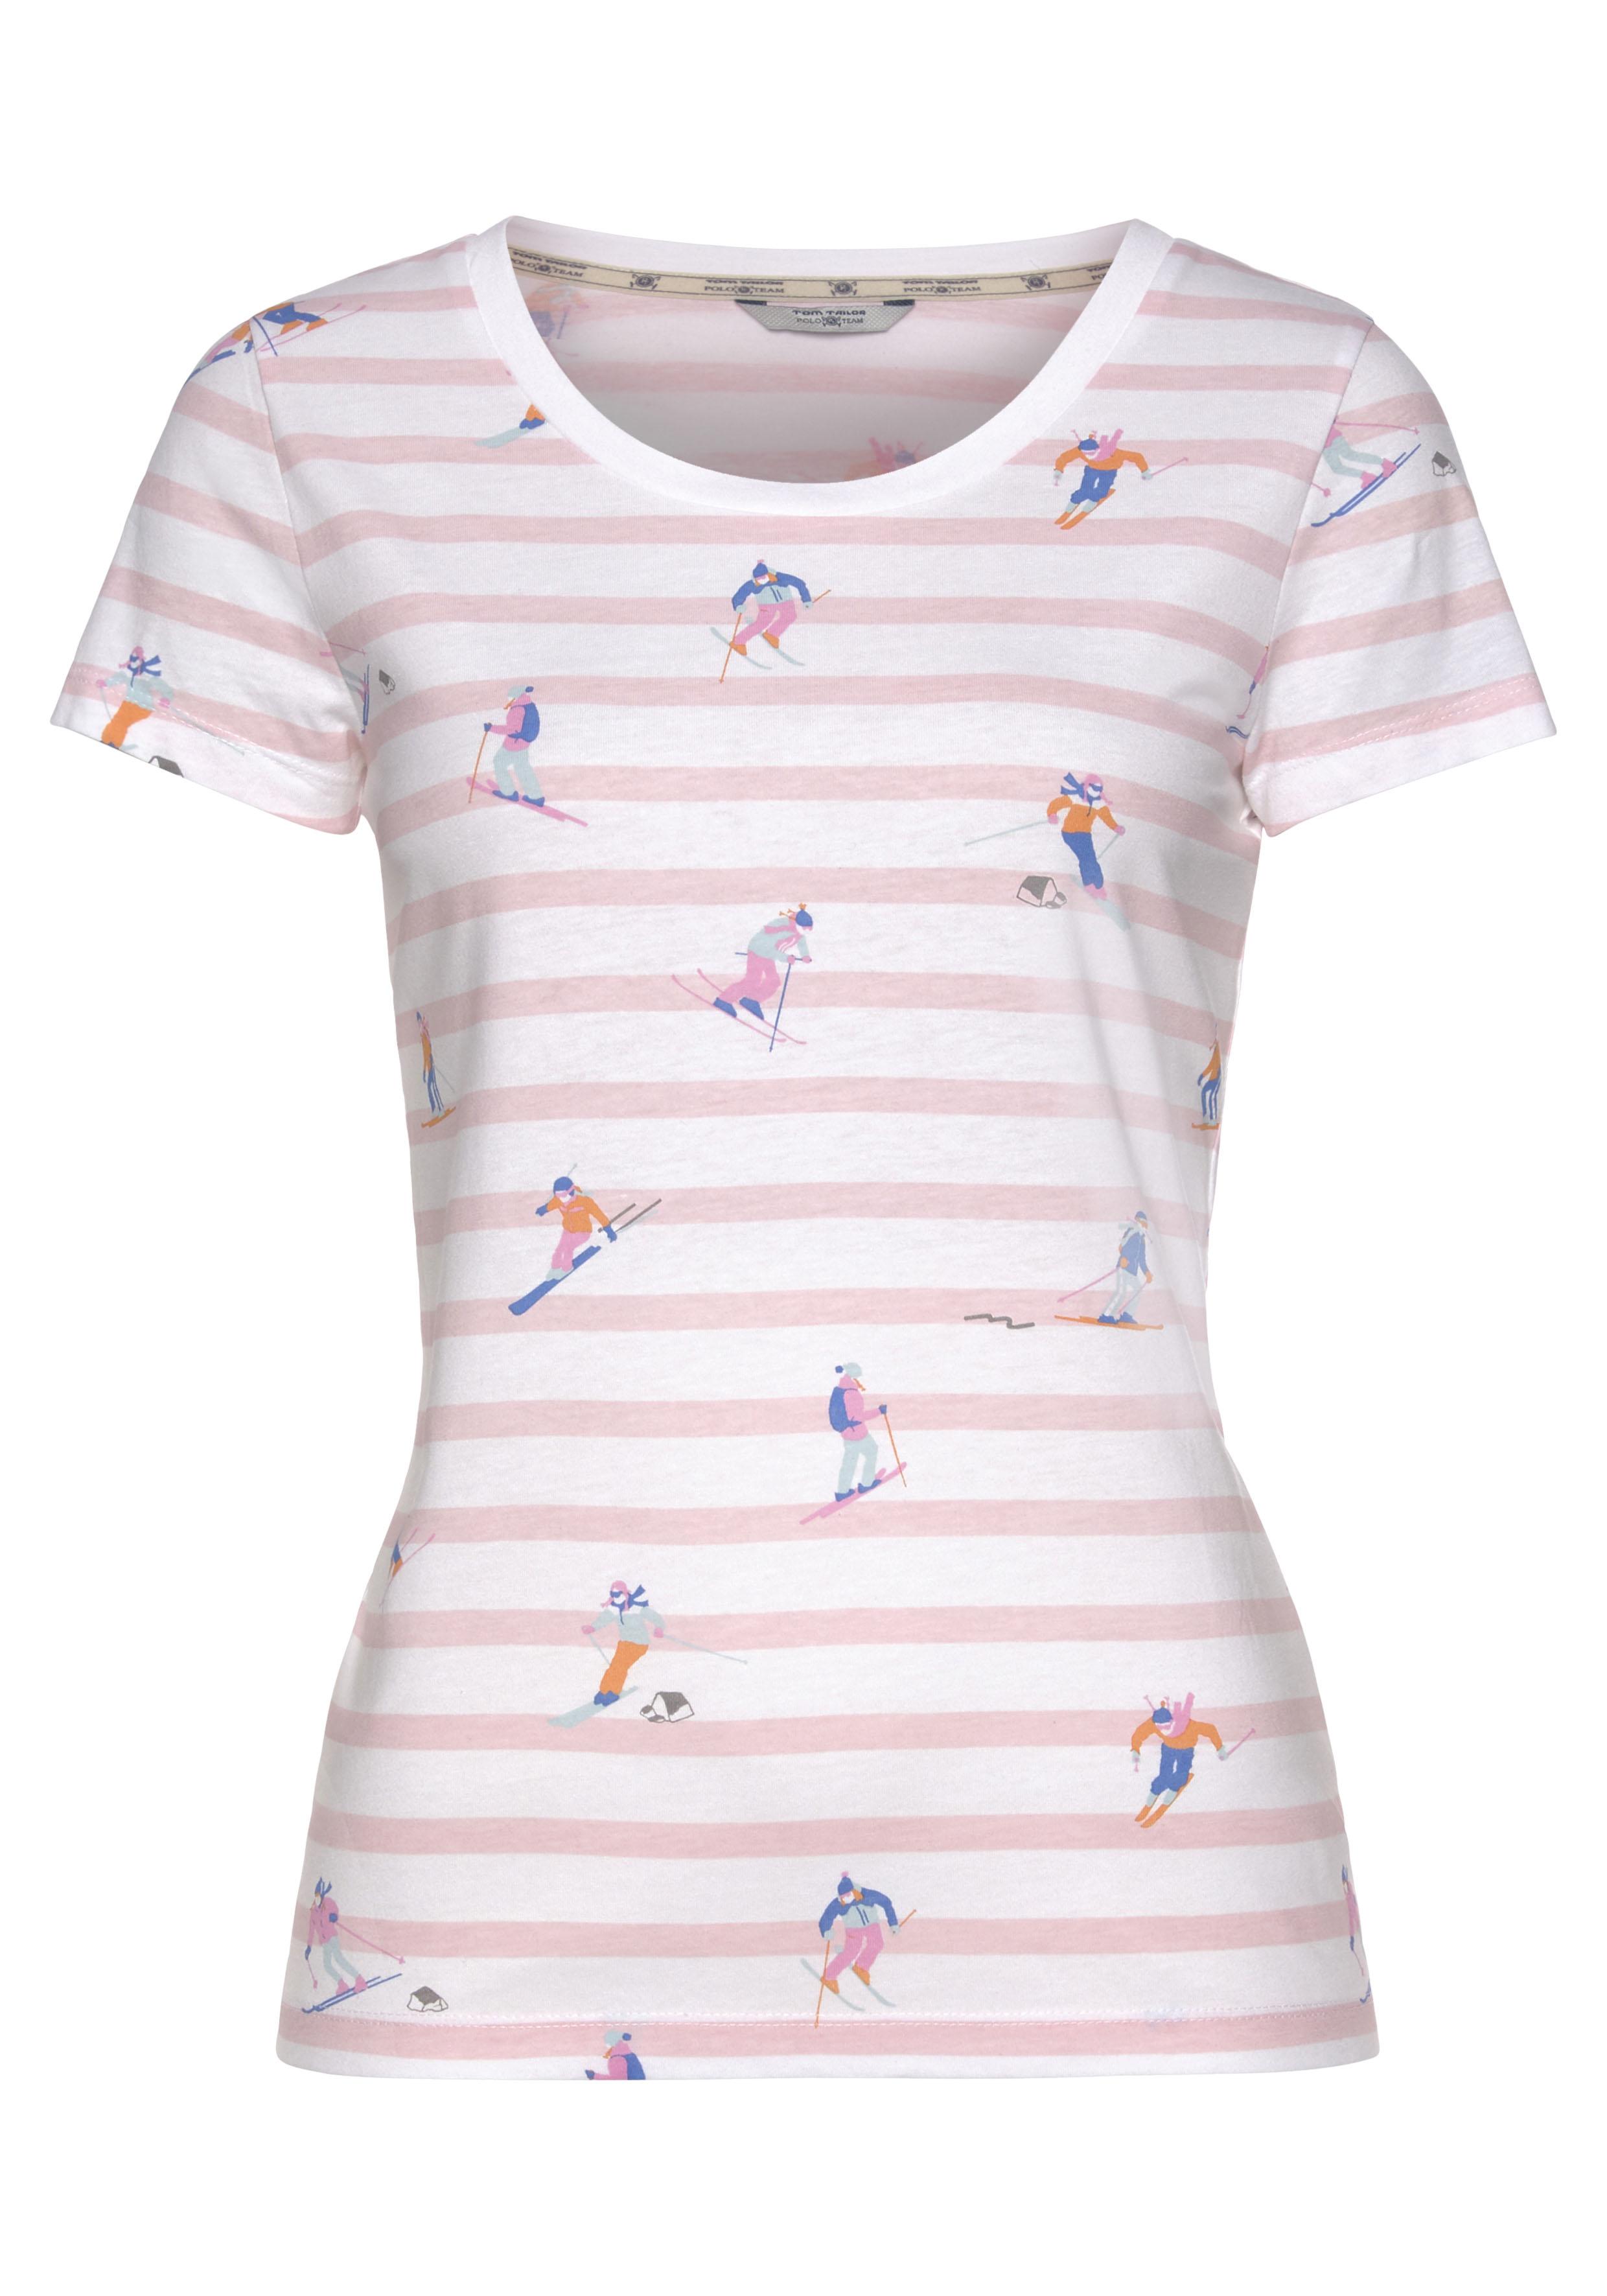 tom tailor polo team -  T-Shirt